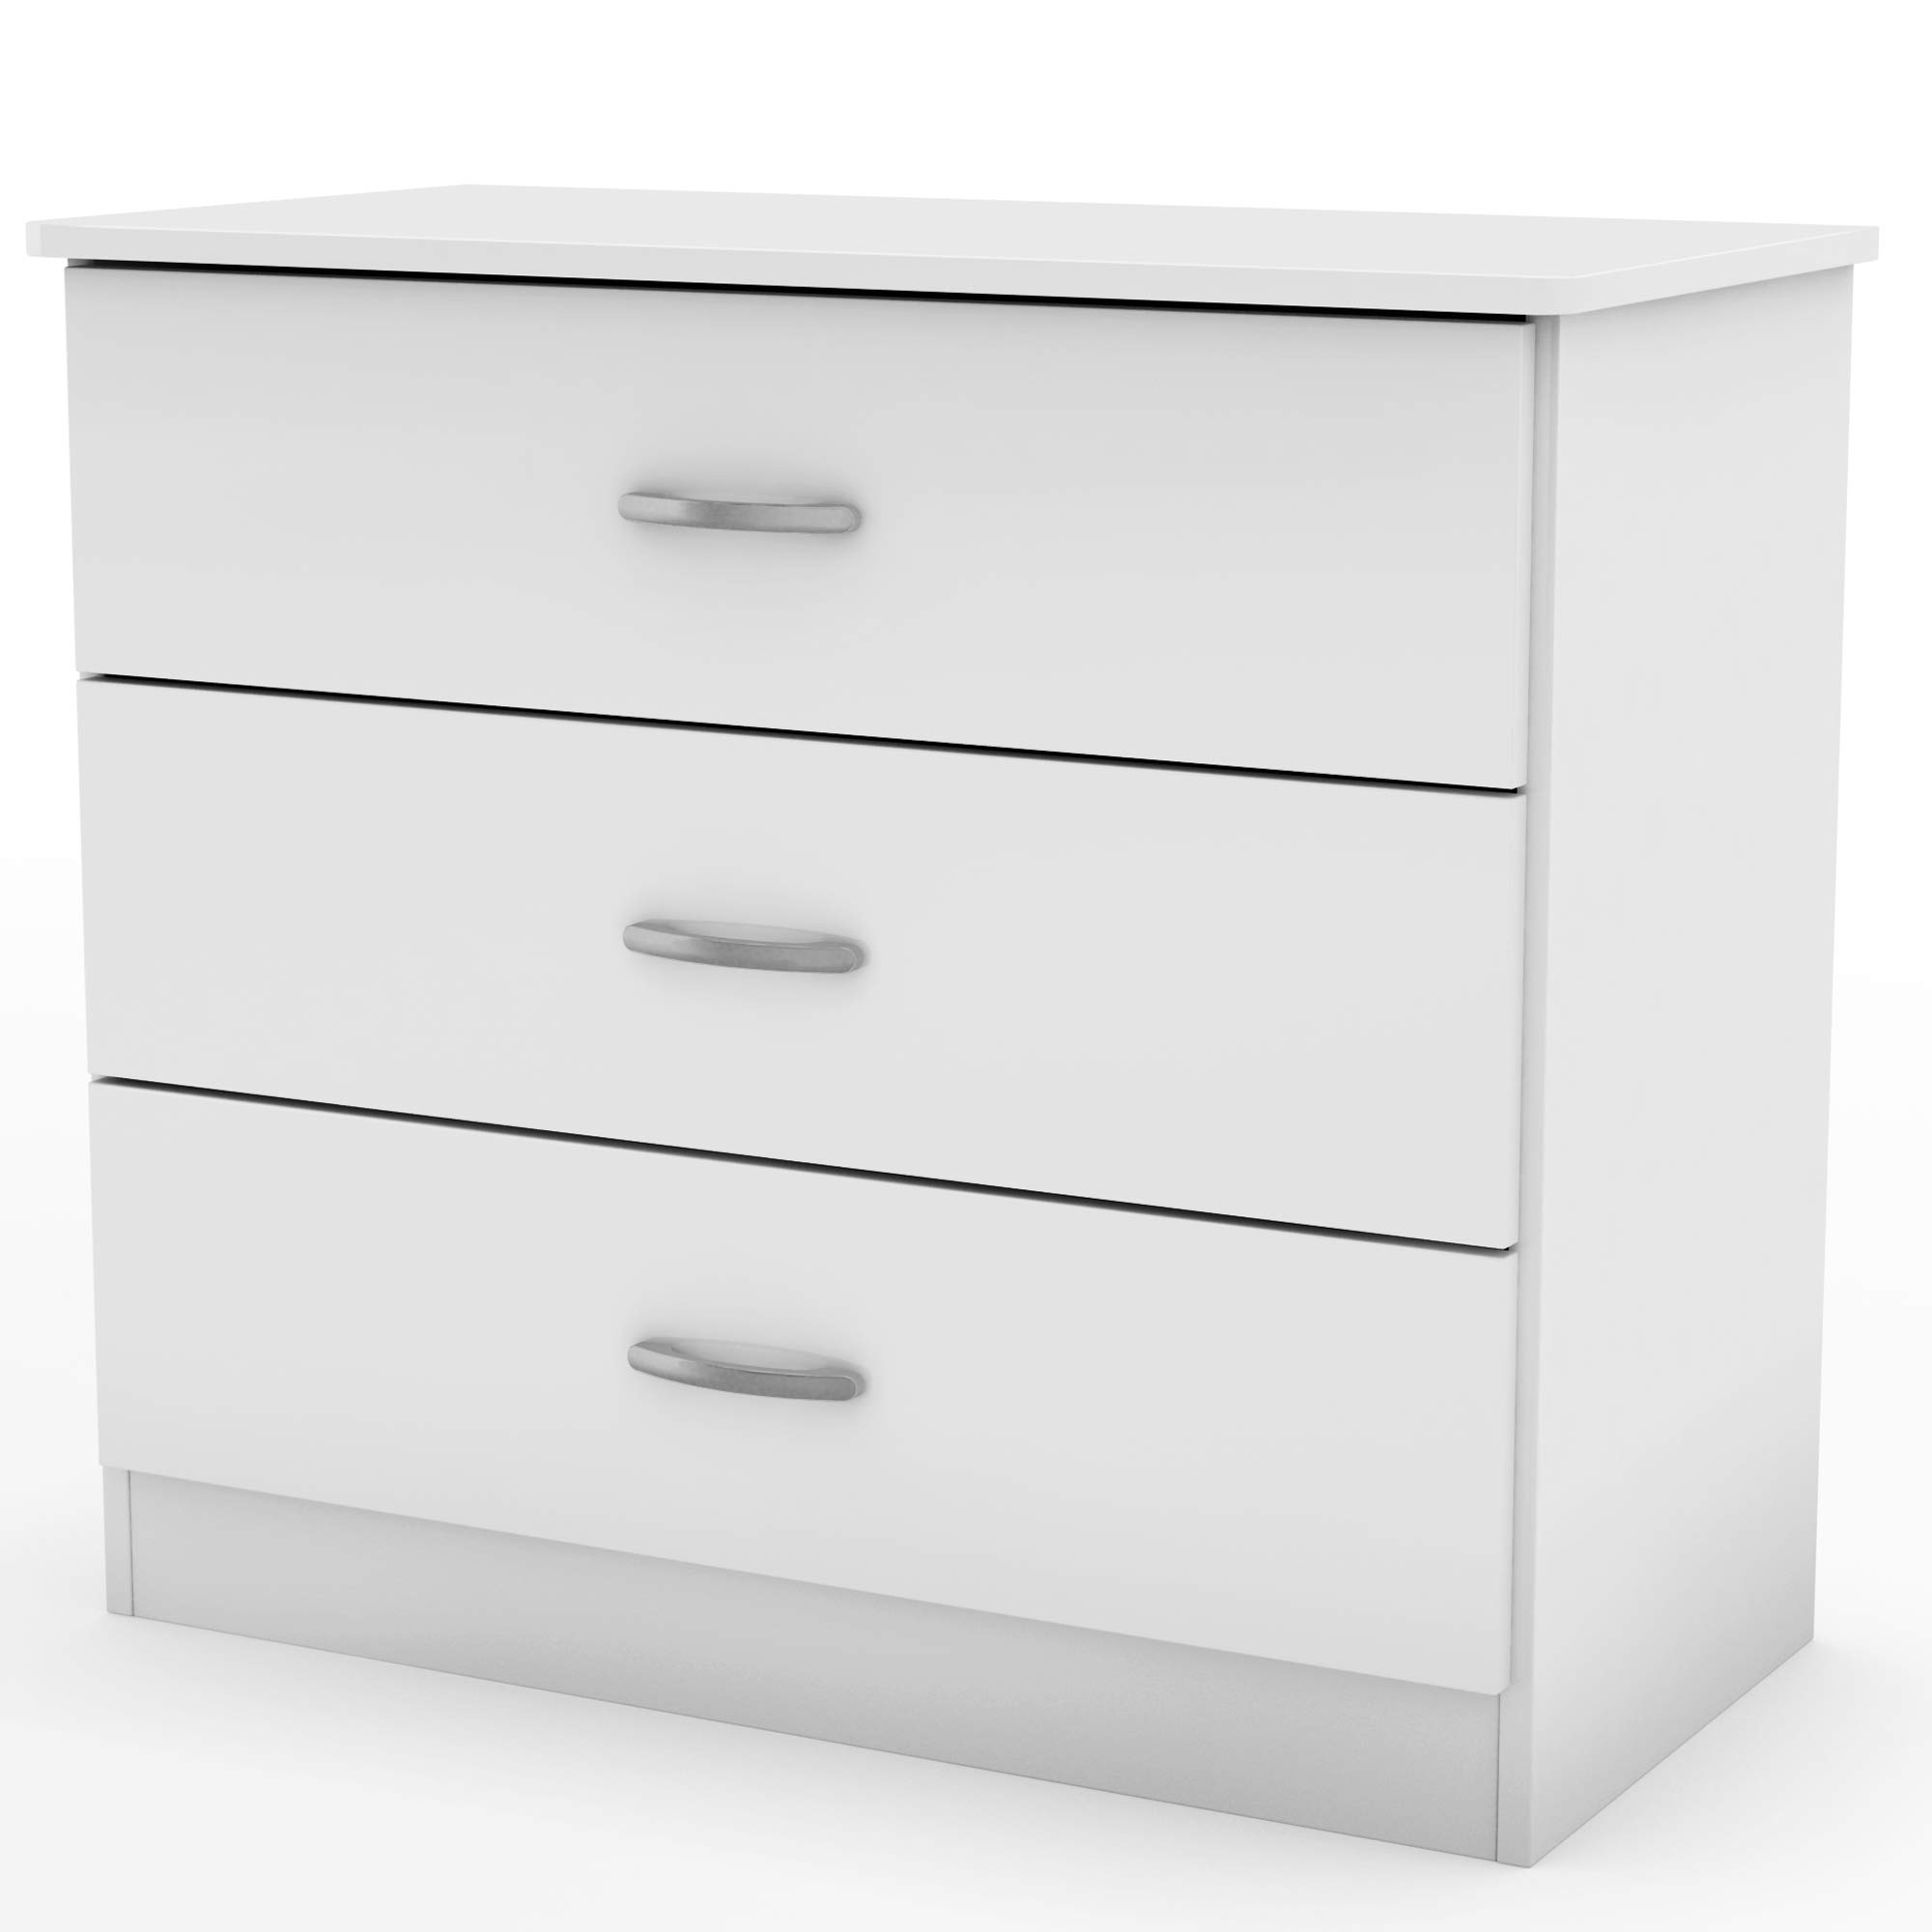 South Shore 12651 Libra 3-Drawer Chest-Pure White